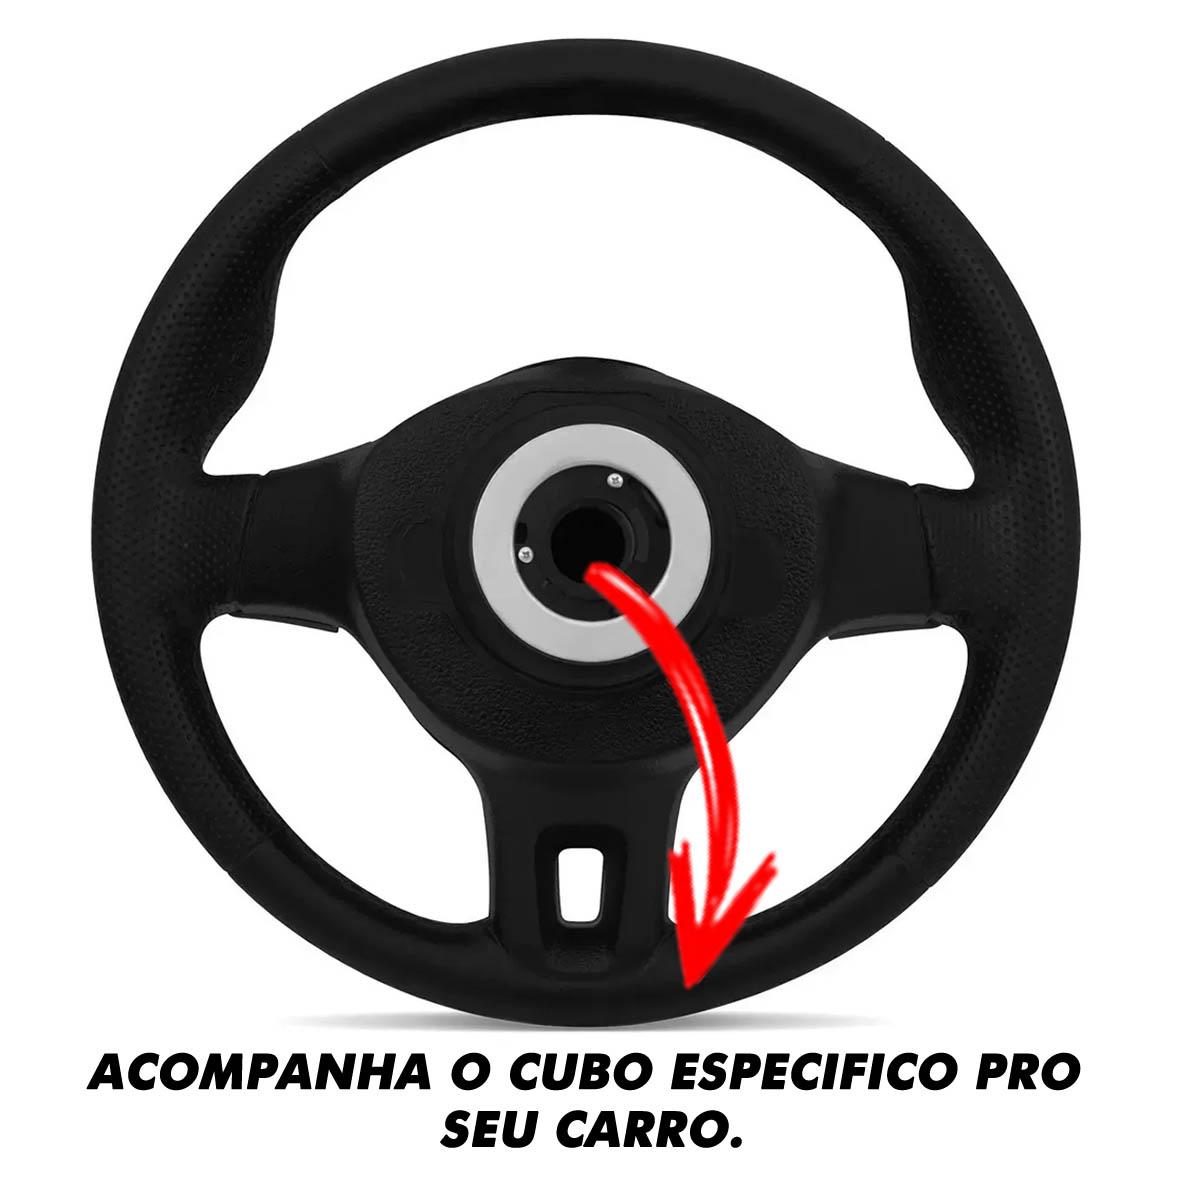 Volante Volkswagen Jetta Redondo Esportivo Cubo Voyage 1980 a 2013 Fox Bora Polo 1999 a 2013 Santana 1976 a 2013 Poliparts